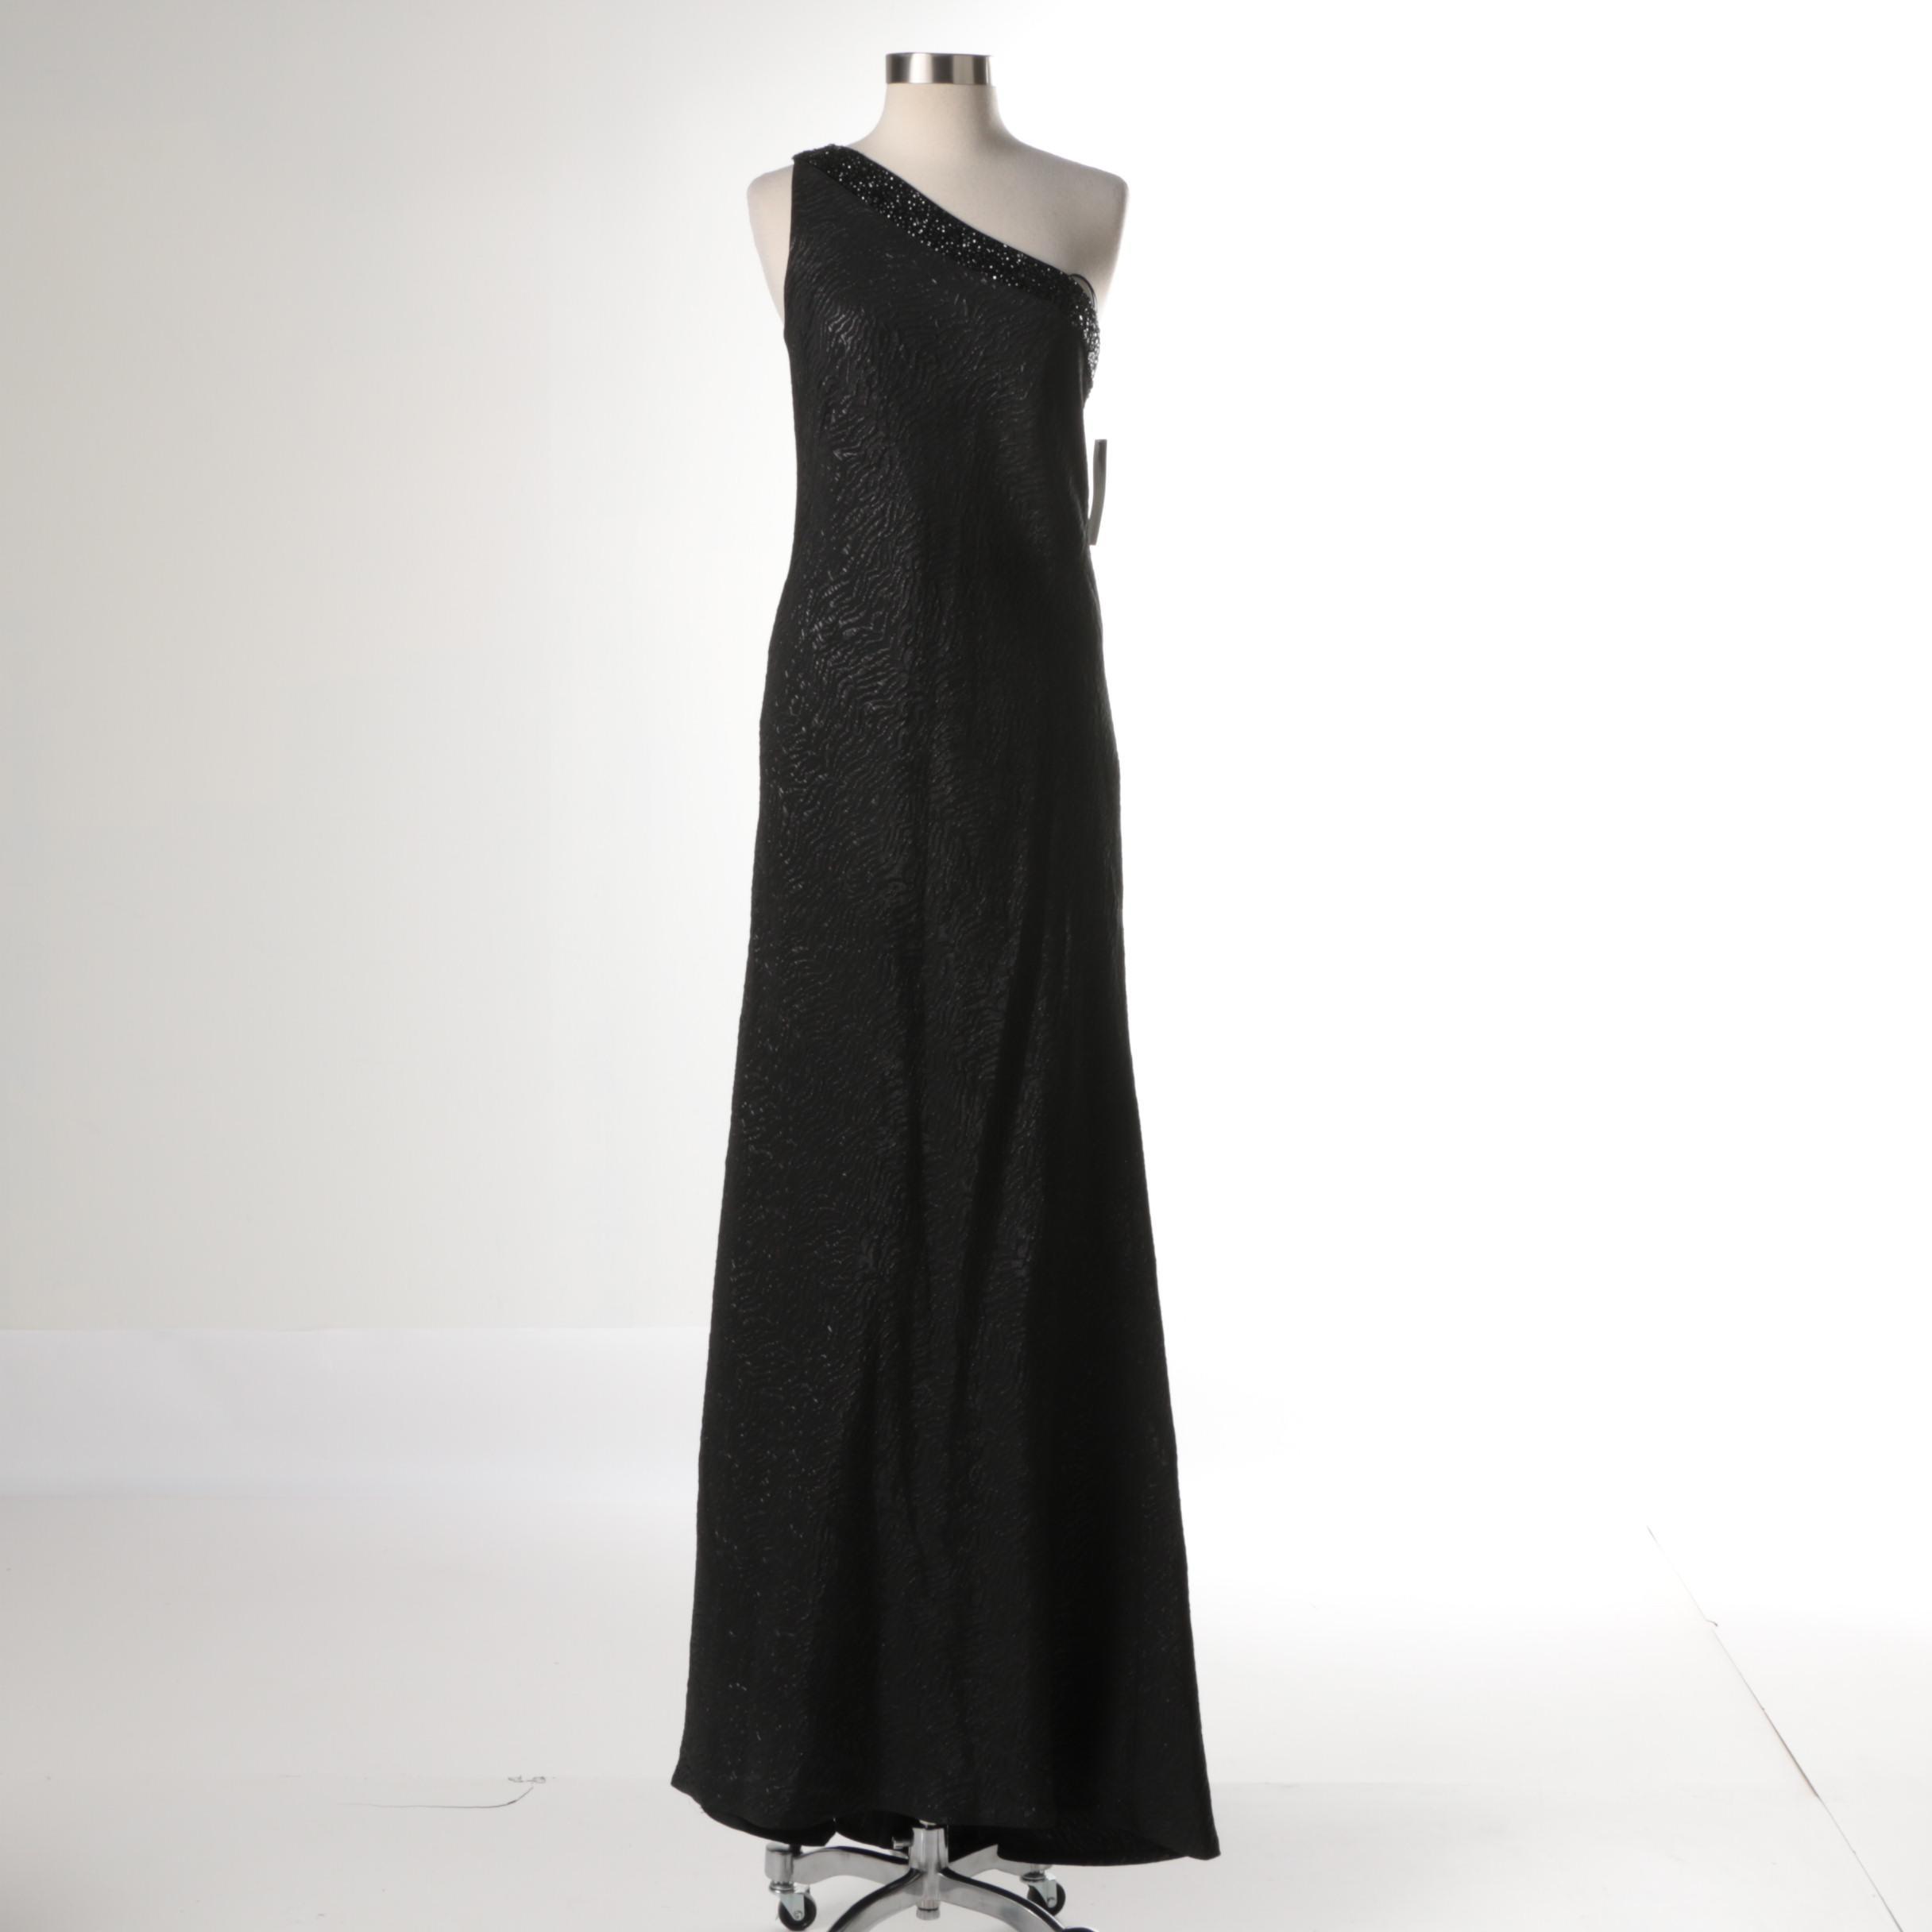 Carmen Marc Valvo Black One-Shoulder Evening Dress